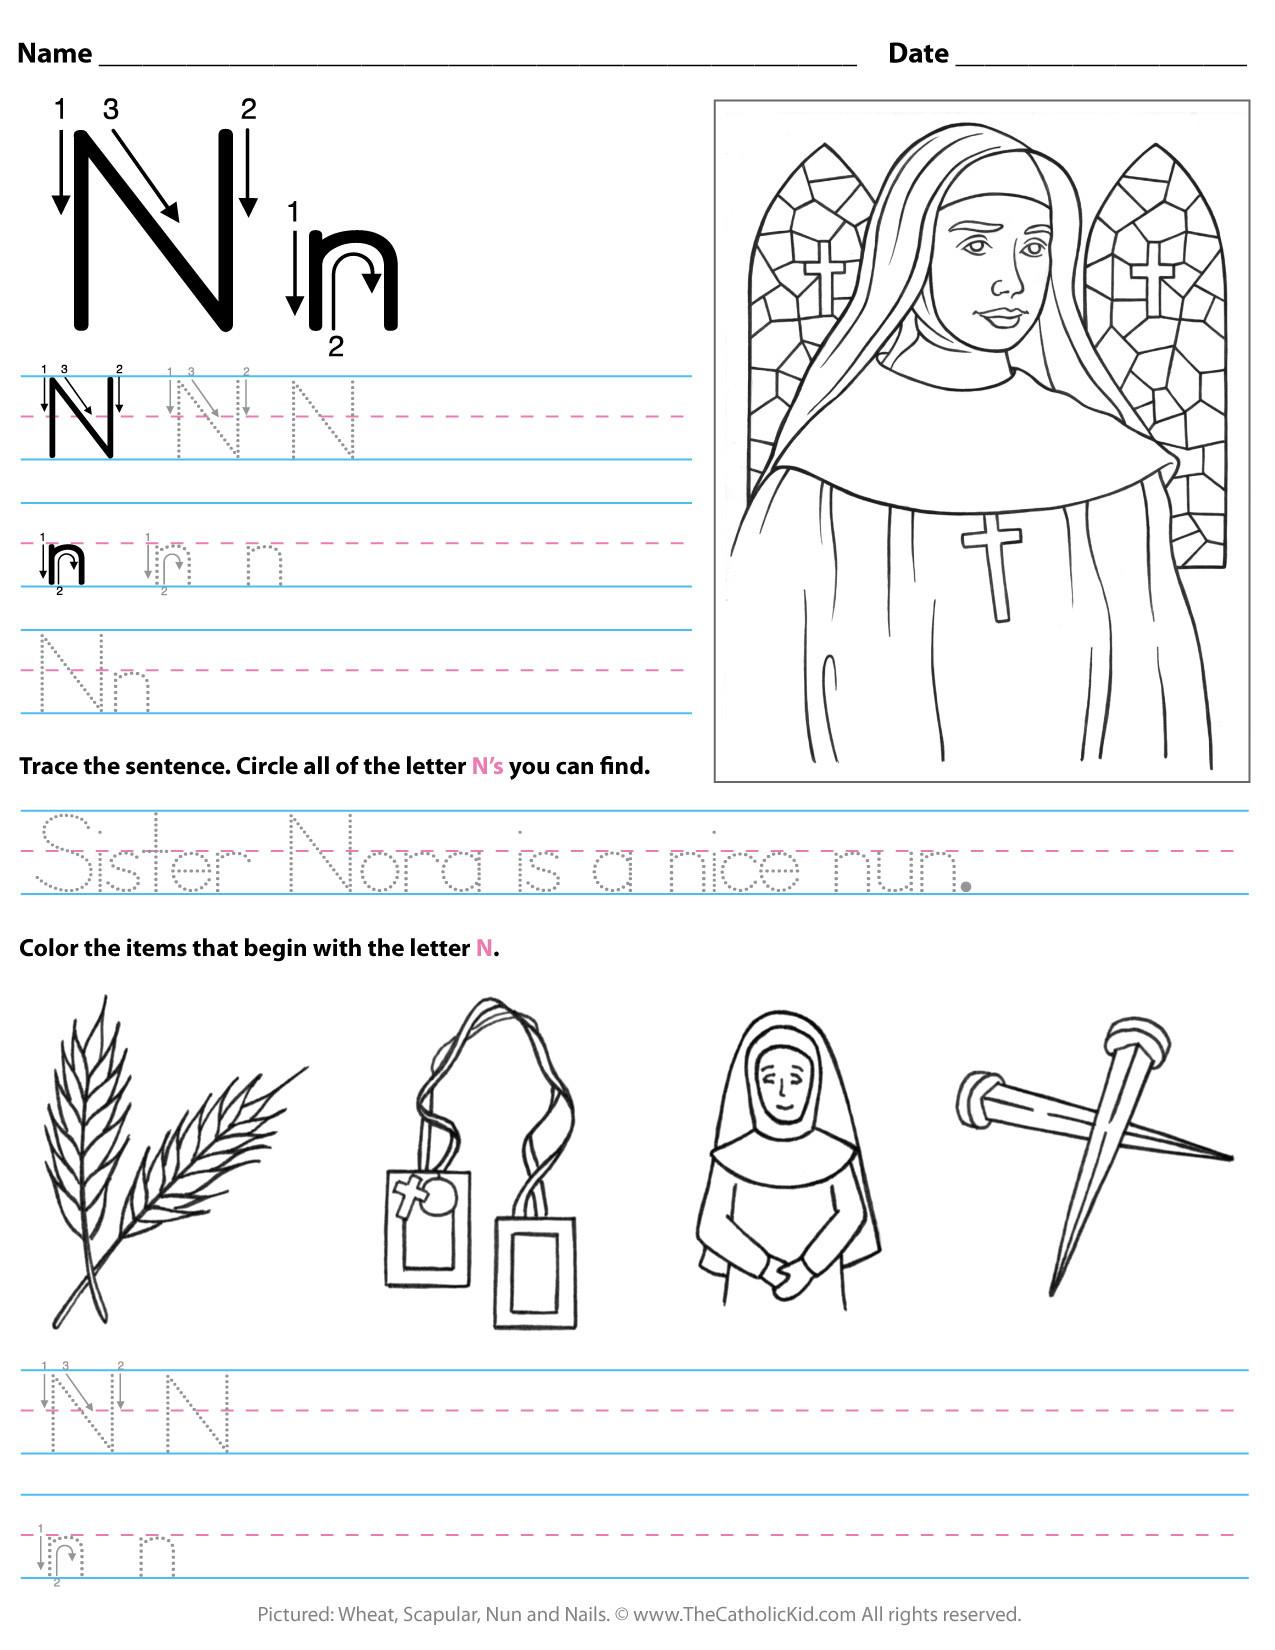 Letter N Worksheets for Kindergarten Catholic Alphabet Letter N Worksheet Preschool Kindergarten